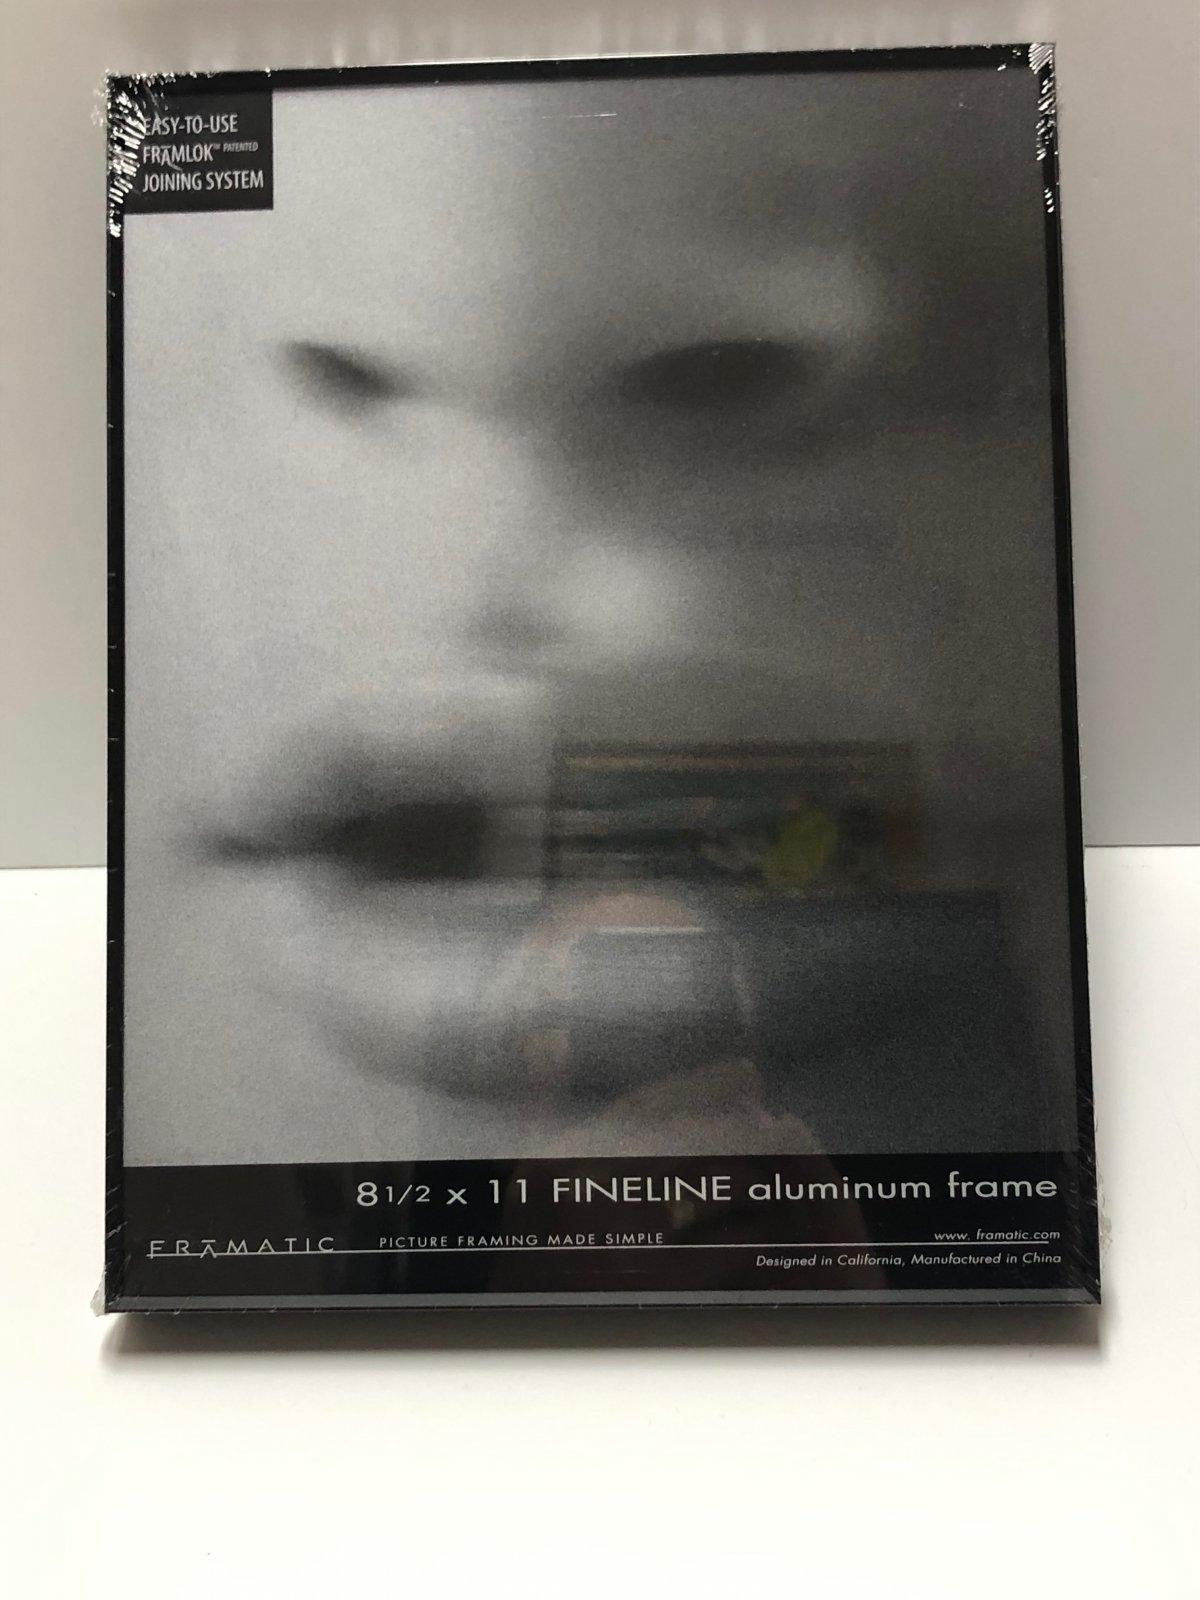 Framatic Fineline 8 1/2 x 11 Metal Readymade Frame